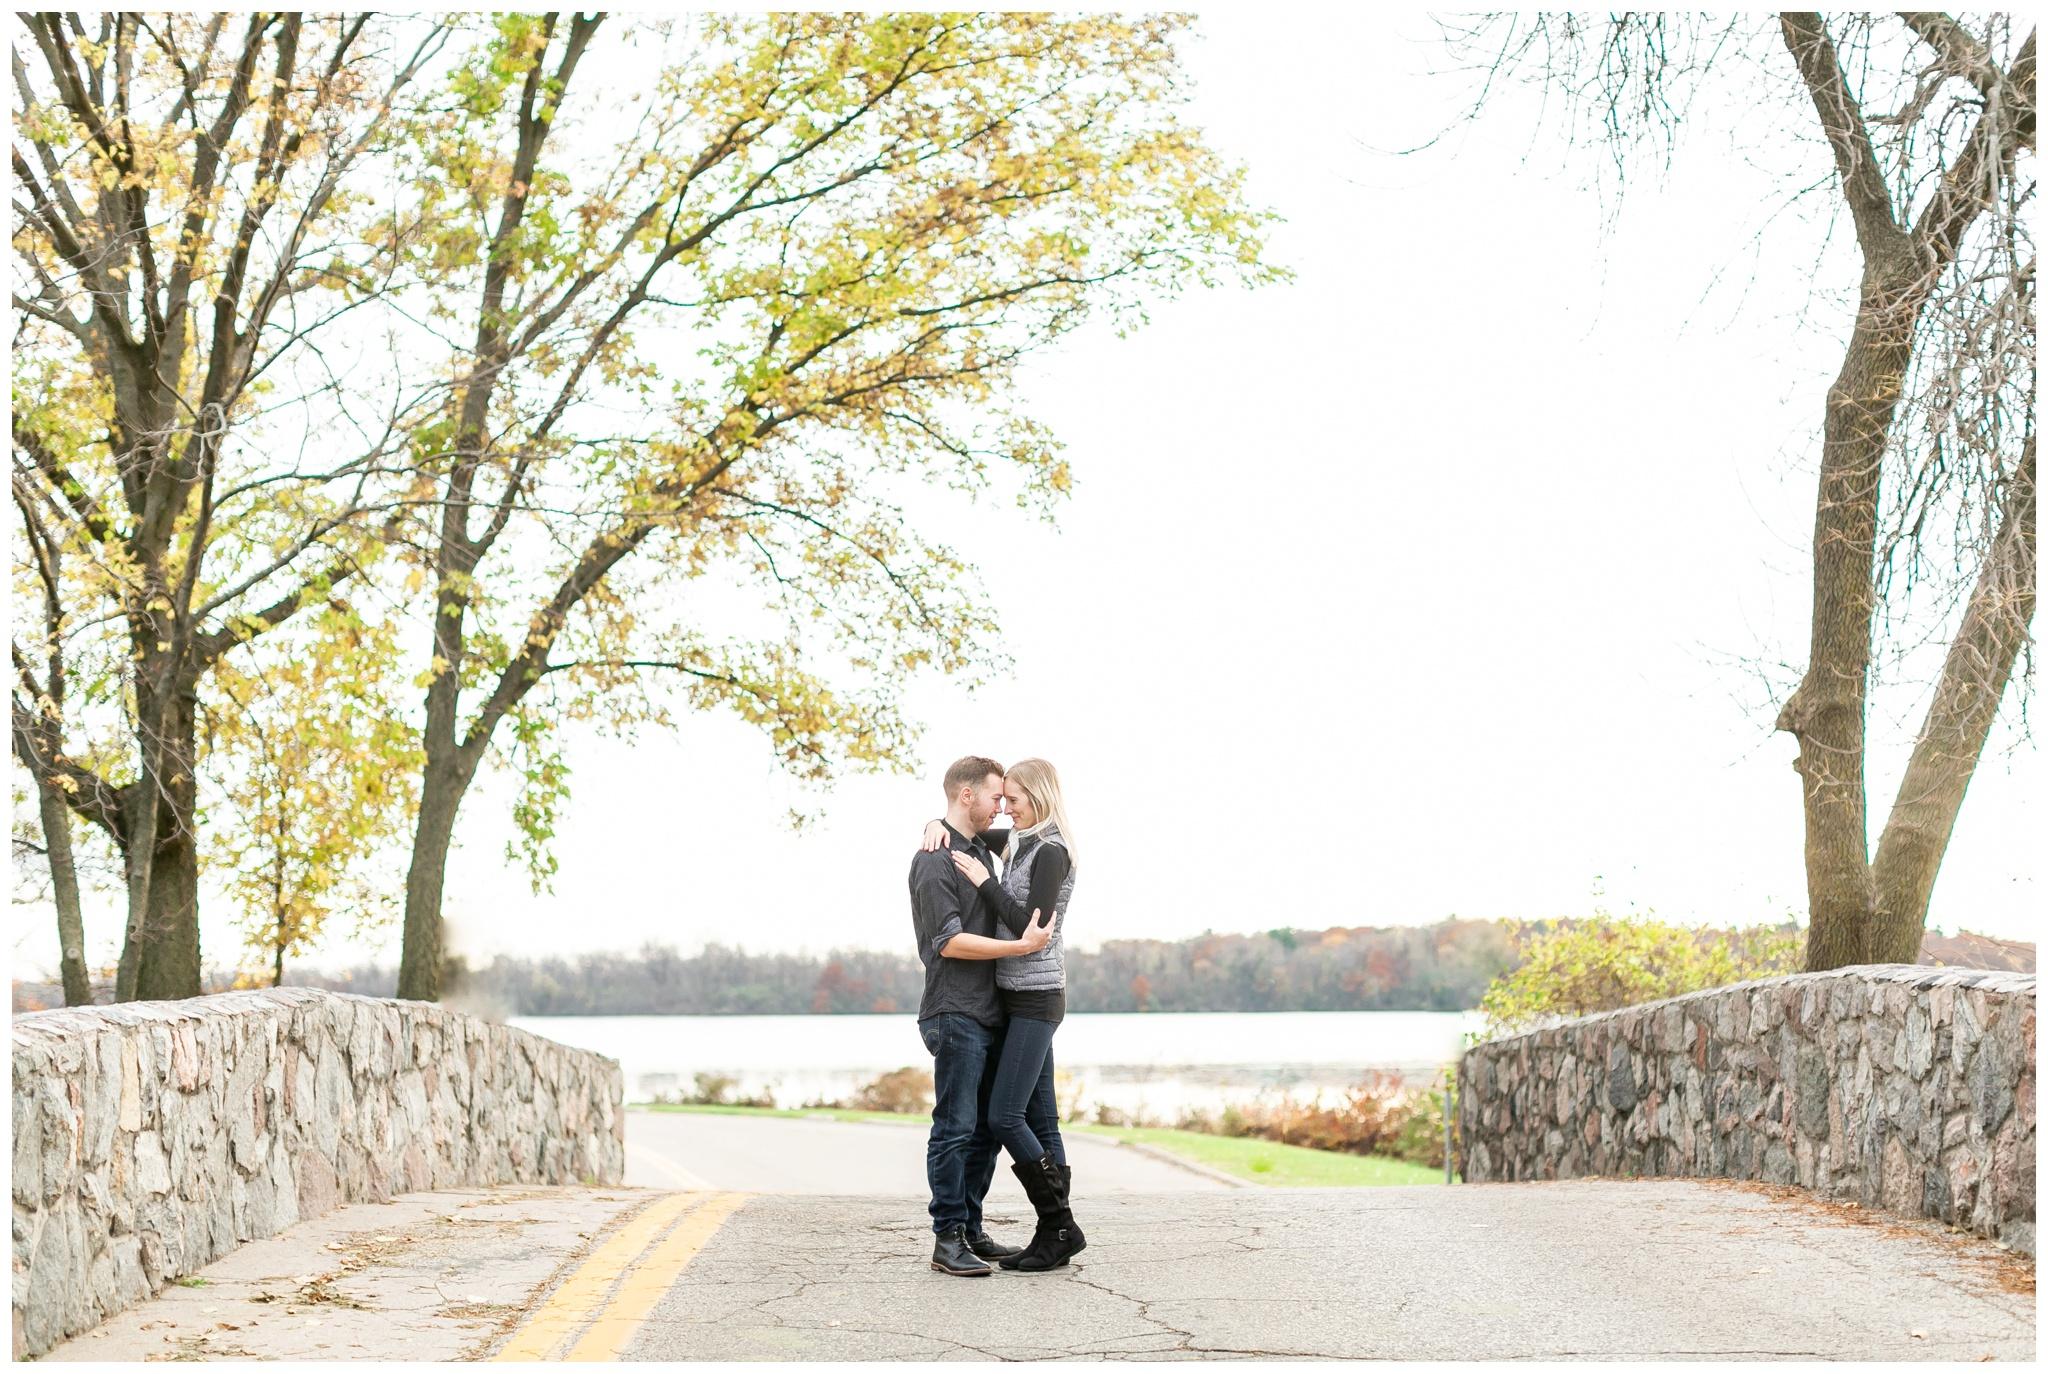 Spring In Vilas Park >> Anne Emmett A Vilas Park Engagement Session In Late Autumn